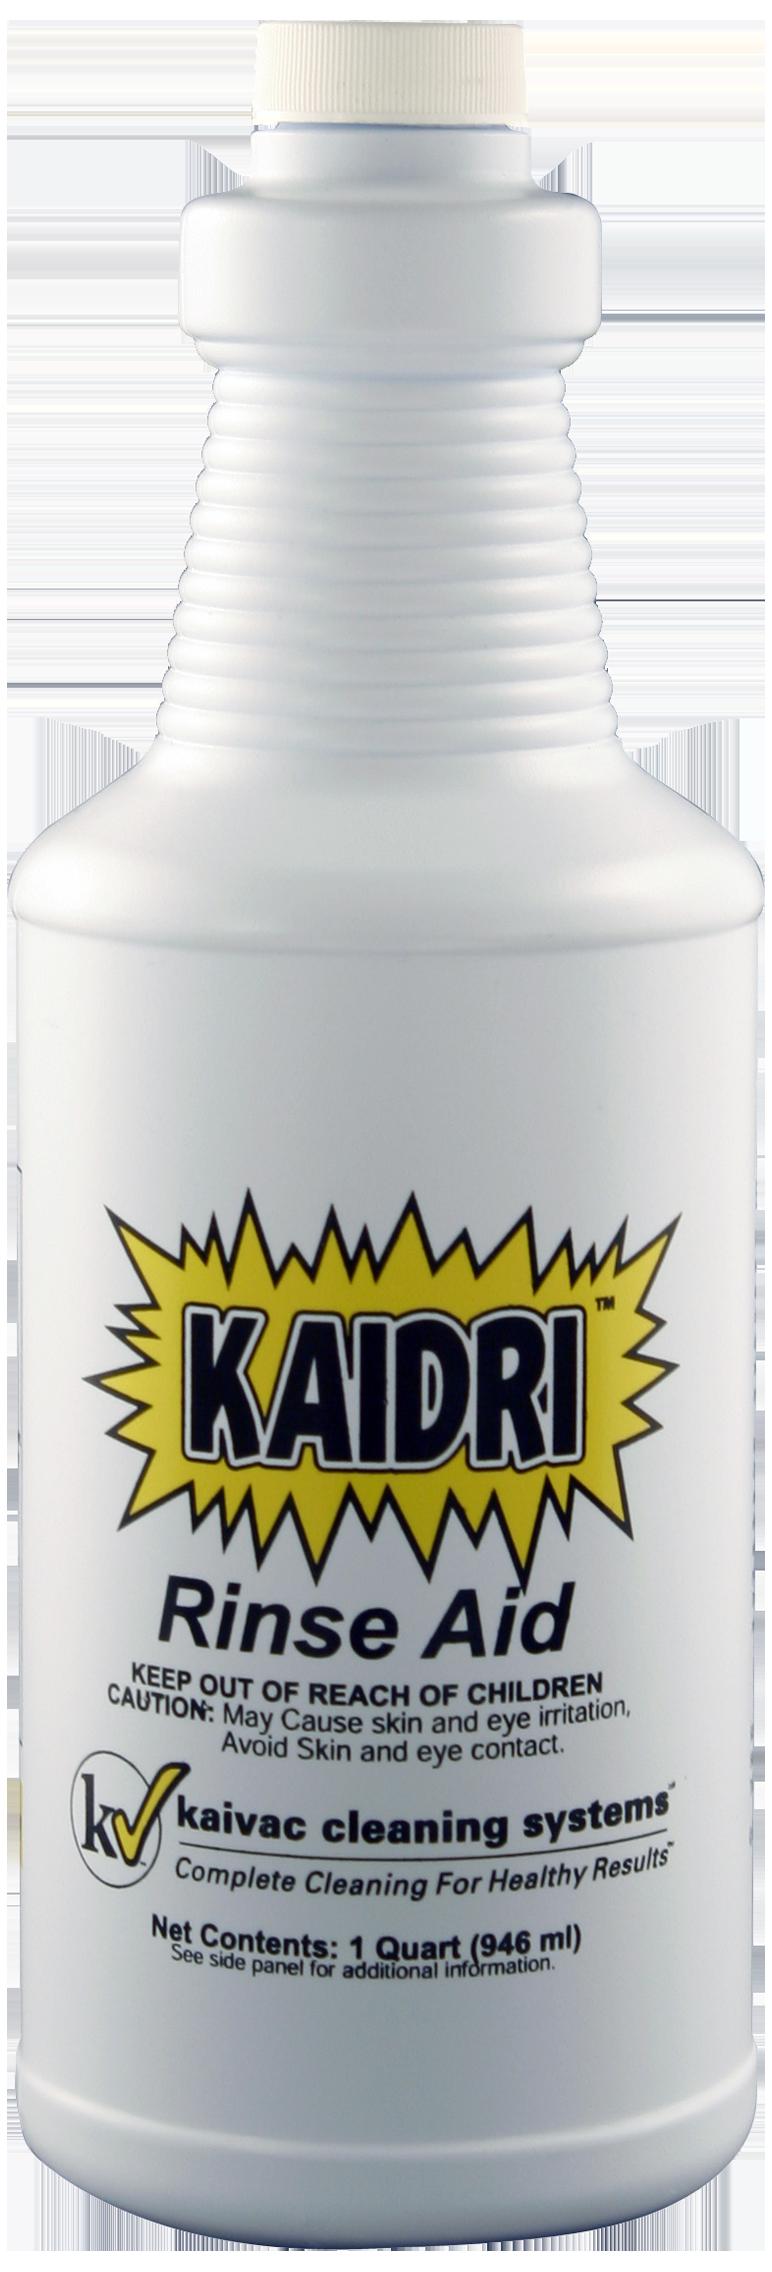 Kaivac KaiDri Rinse Aid